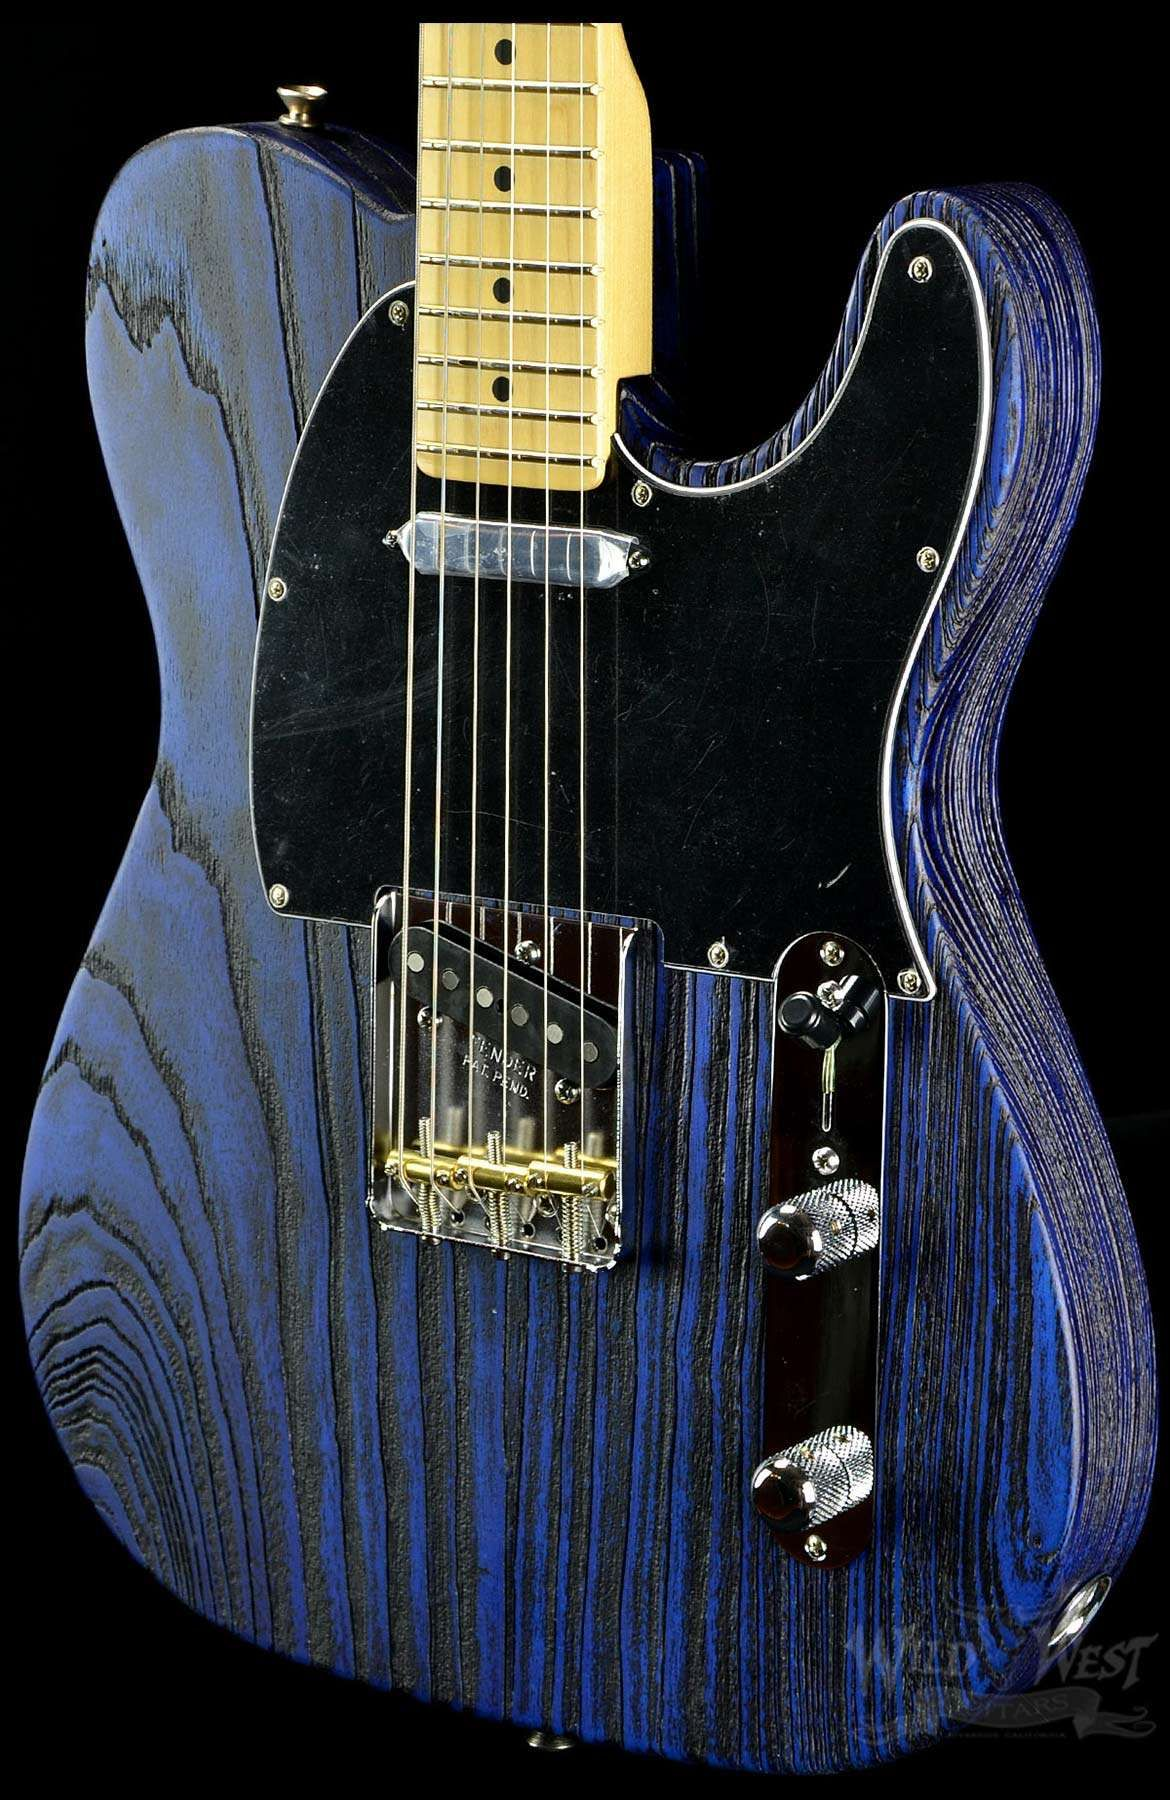 Fender Usa Limited Edition Sandblasted Telecaster Sapphire Blue Home Electrics Rare Finds Used Vintage Hofner 463 S E3 Archtop Transparent Wild West Guitars